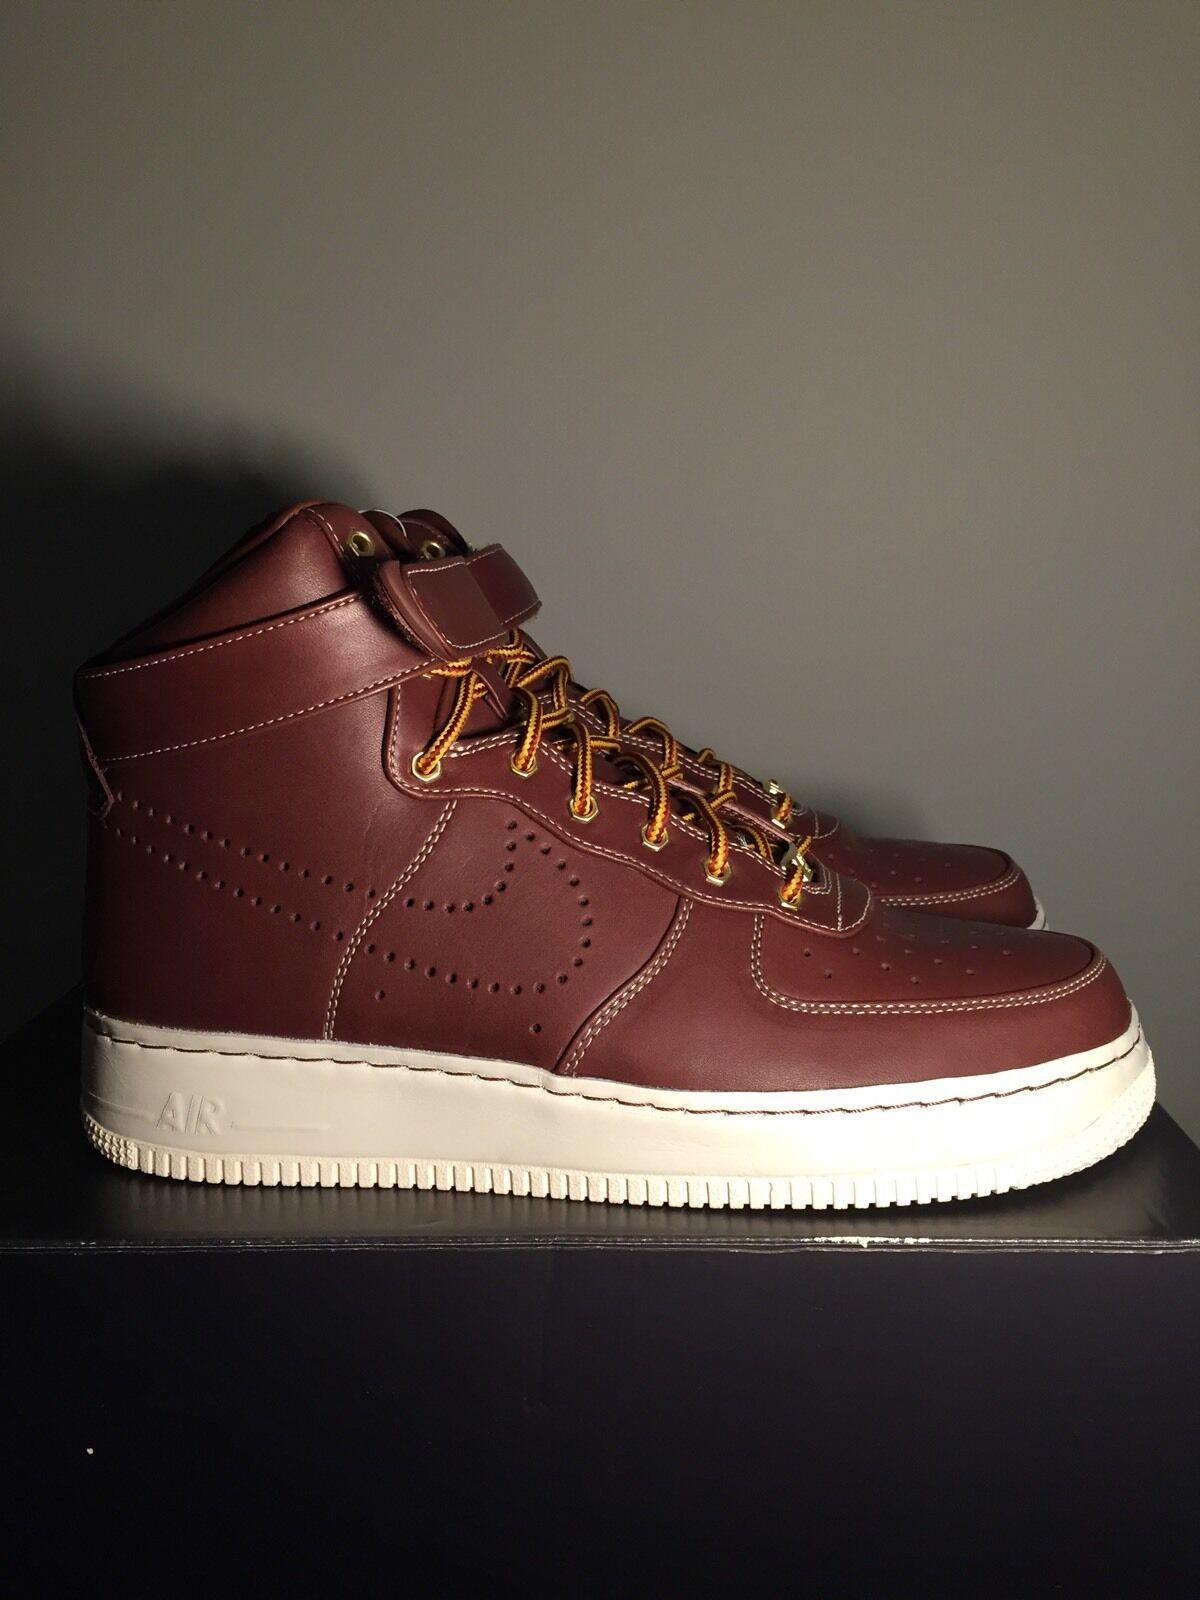 2010 Nike Air Force 1 Supreme Hi, Deep Burgundy-Sail, Burgundy-Sail, Burgundy-Sail,  Work Boot , Size US 9 4c0f3b